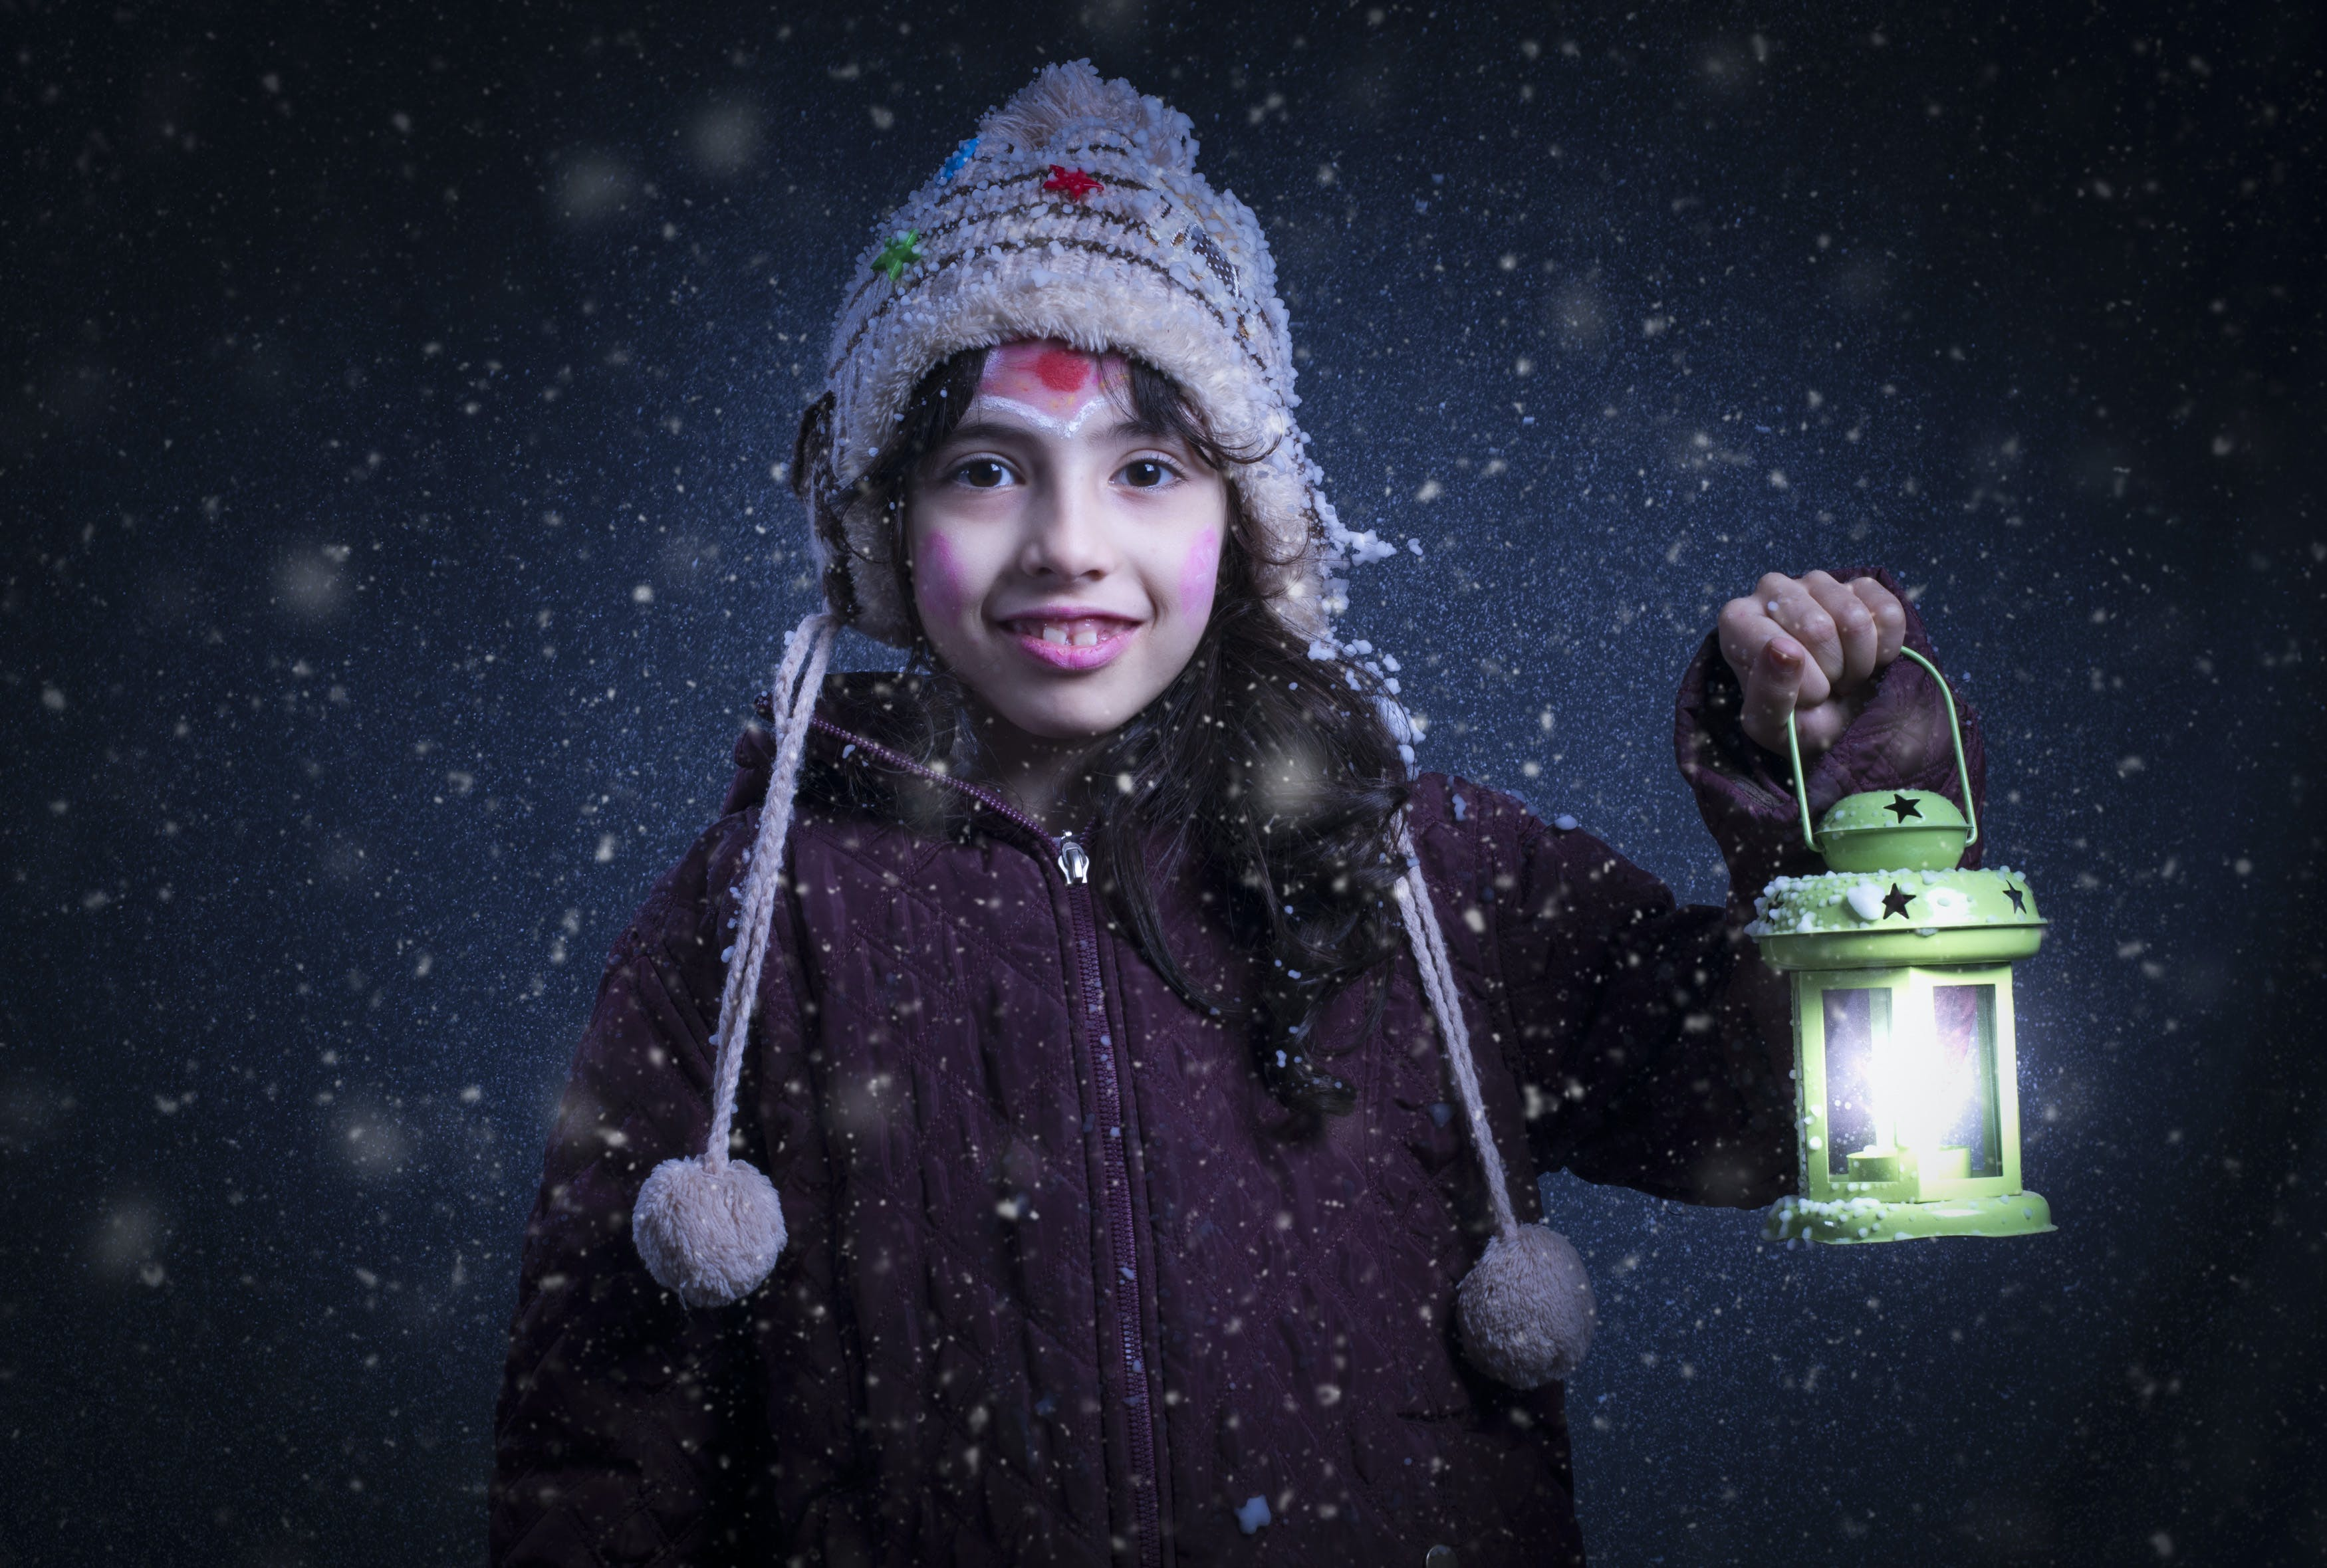 Girl Holding Green Lantern Lamp